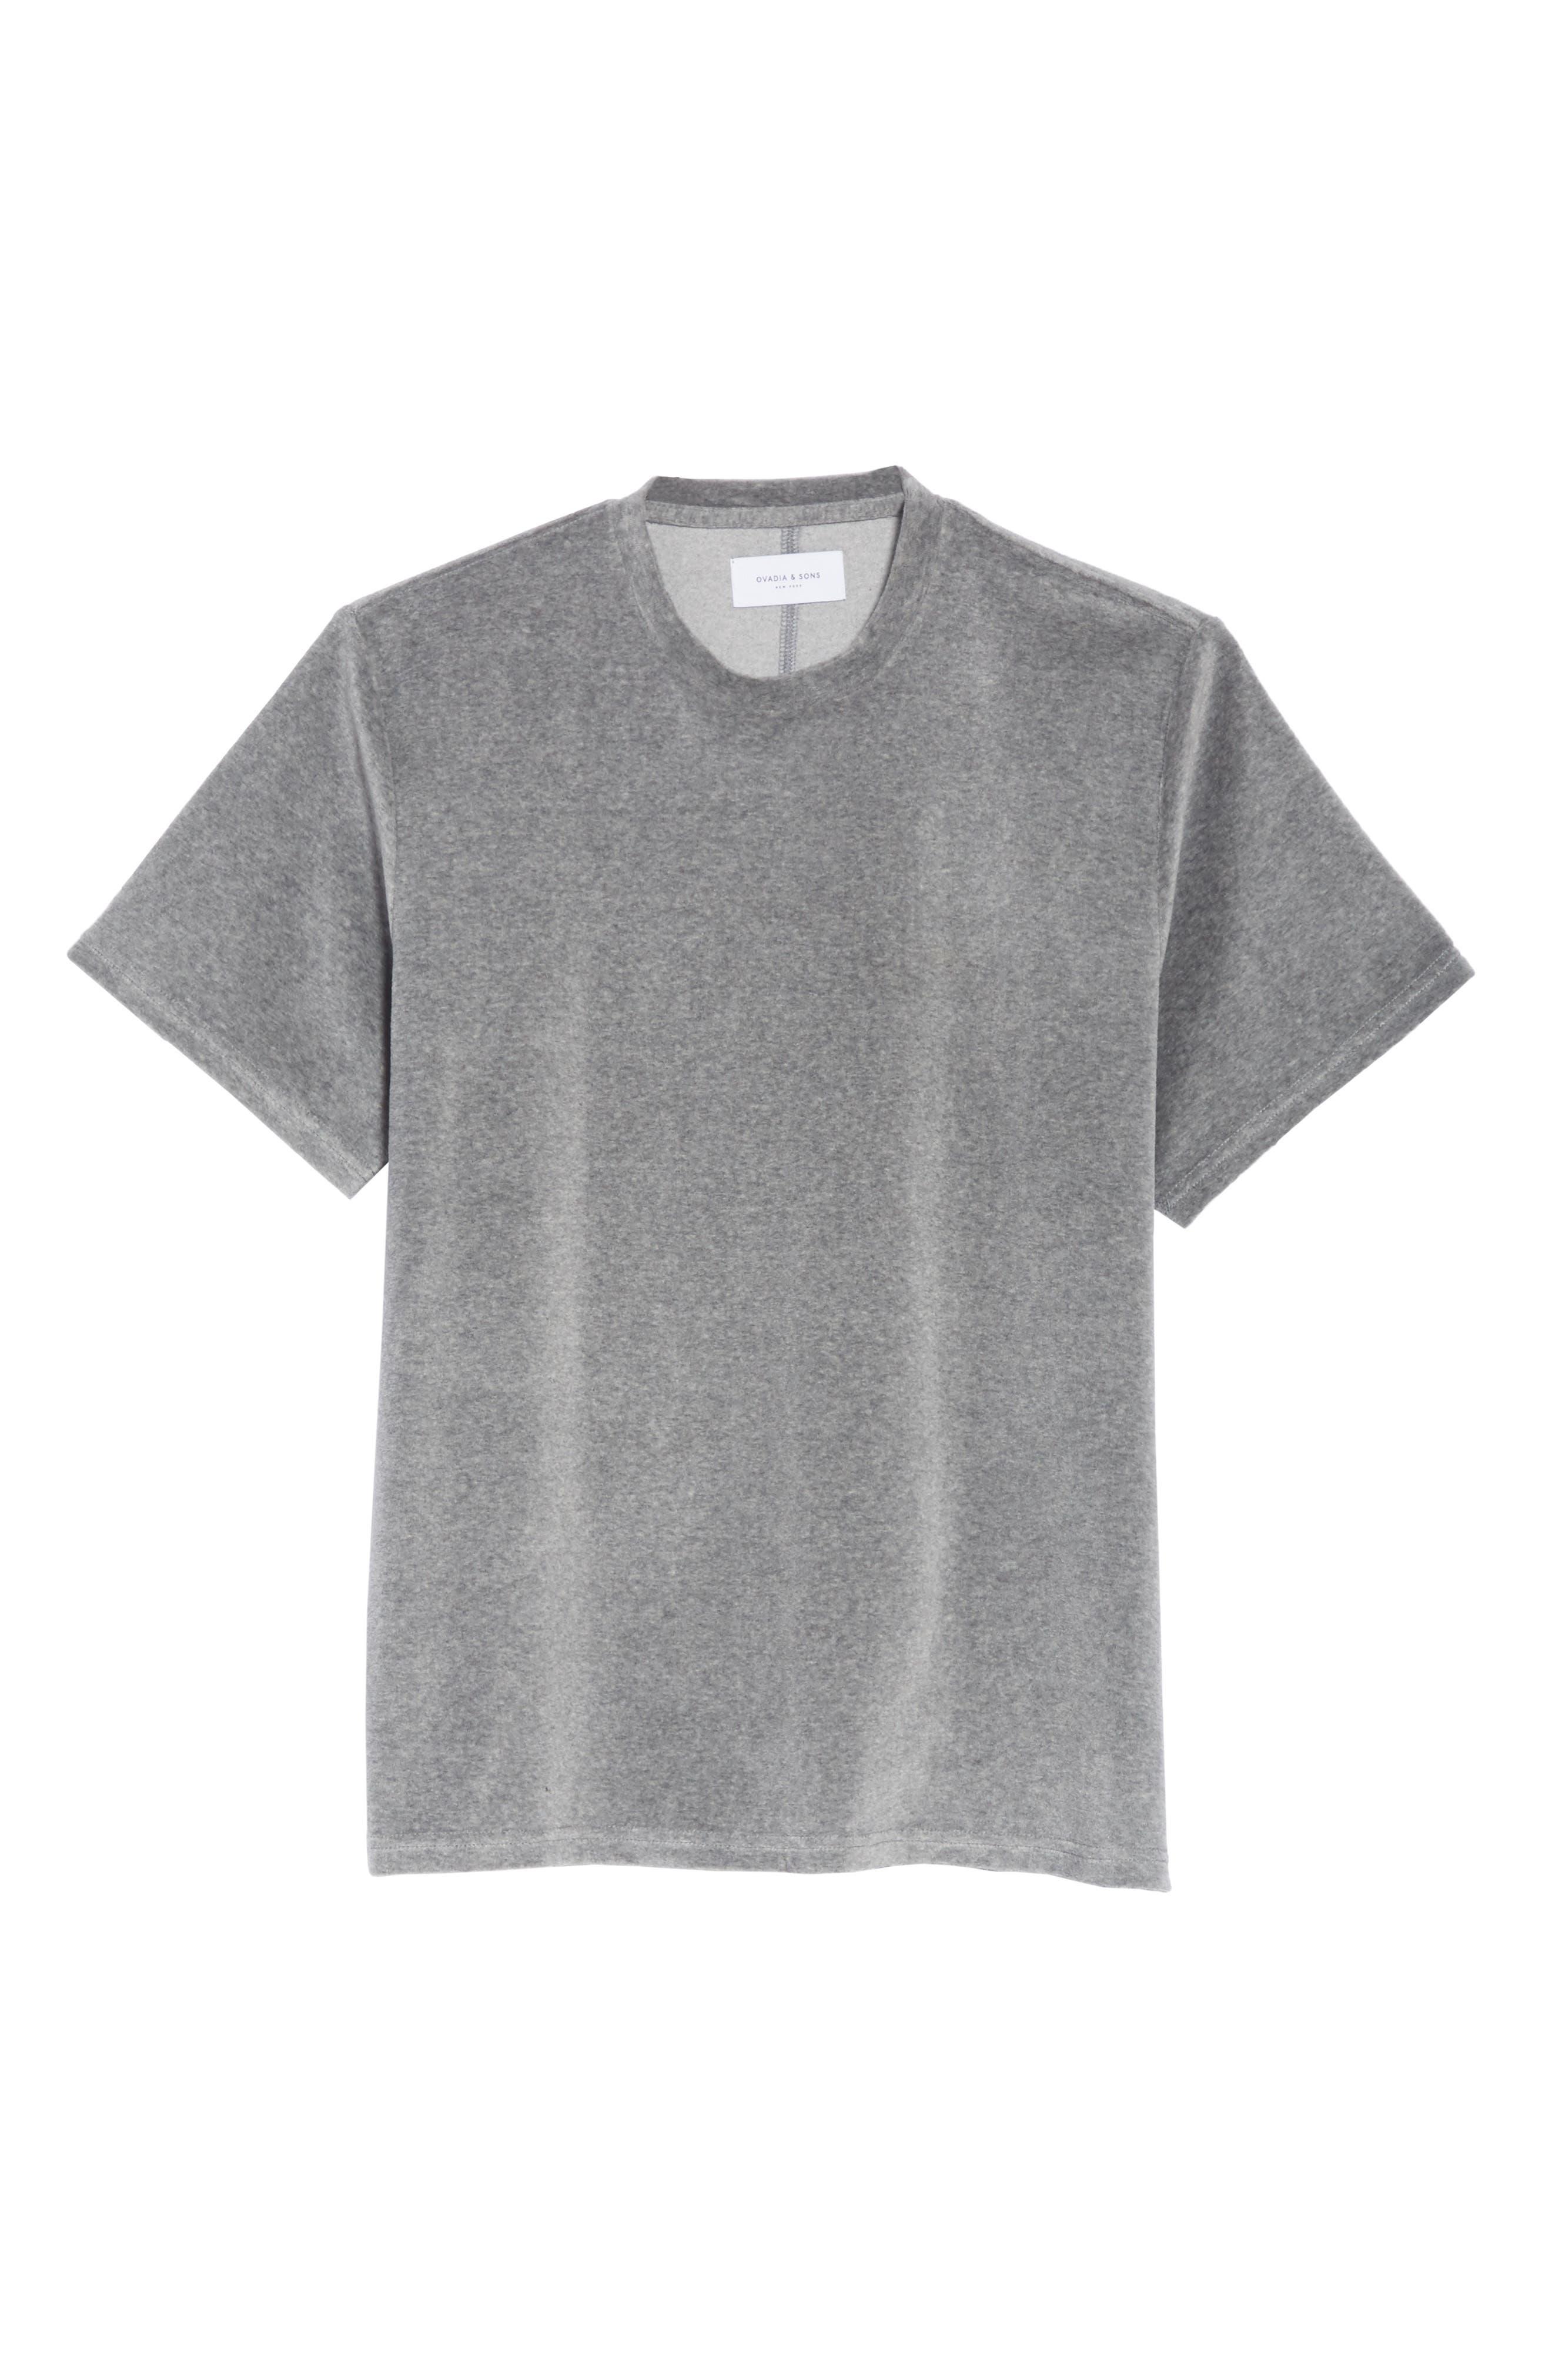 Velour T-Shirt,                             Alternate thumbnail 6, color,                             HEATHER GREY